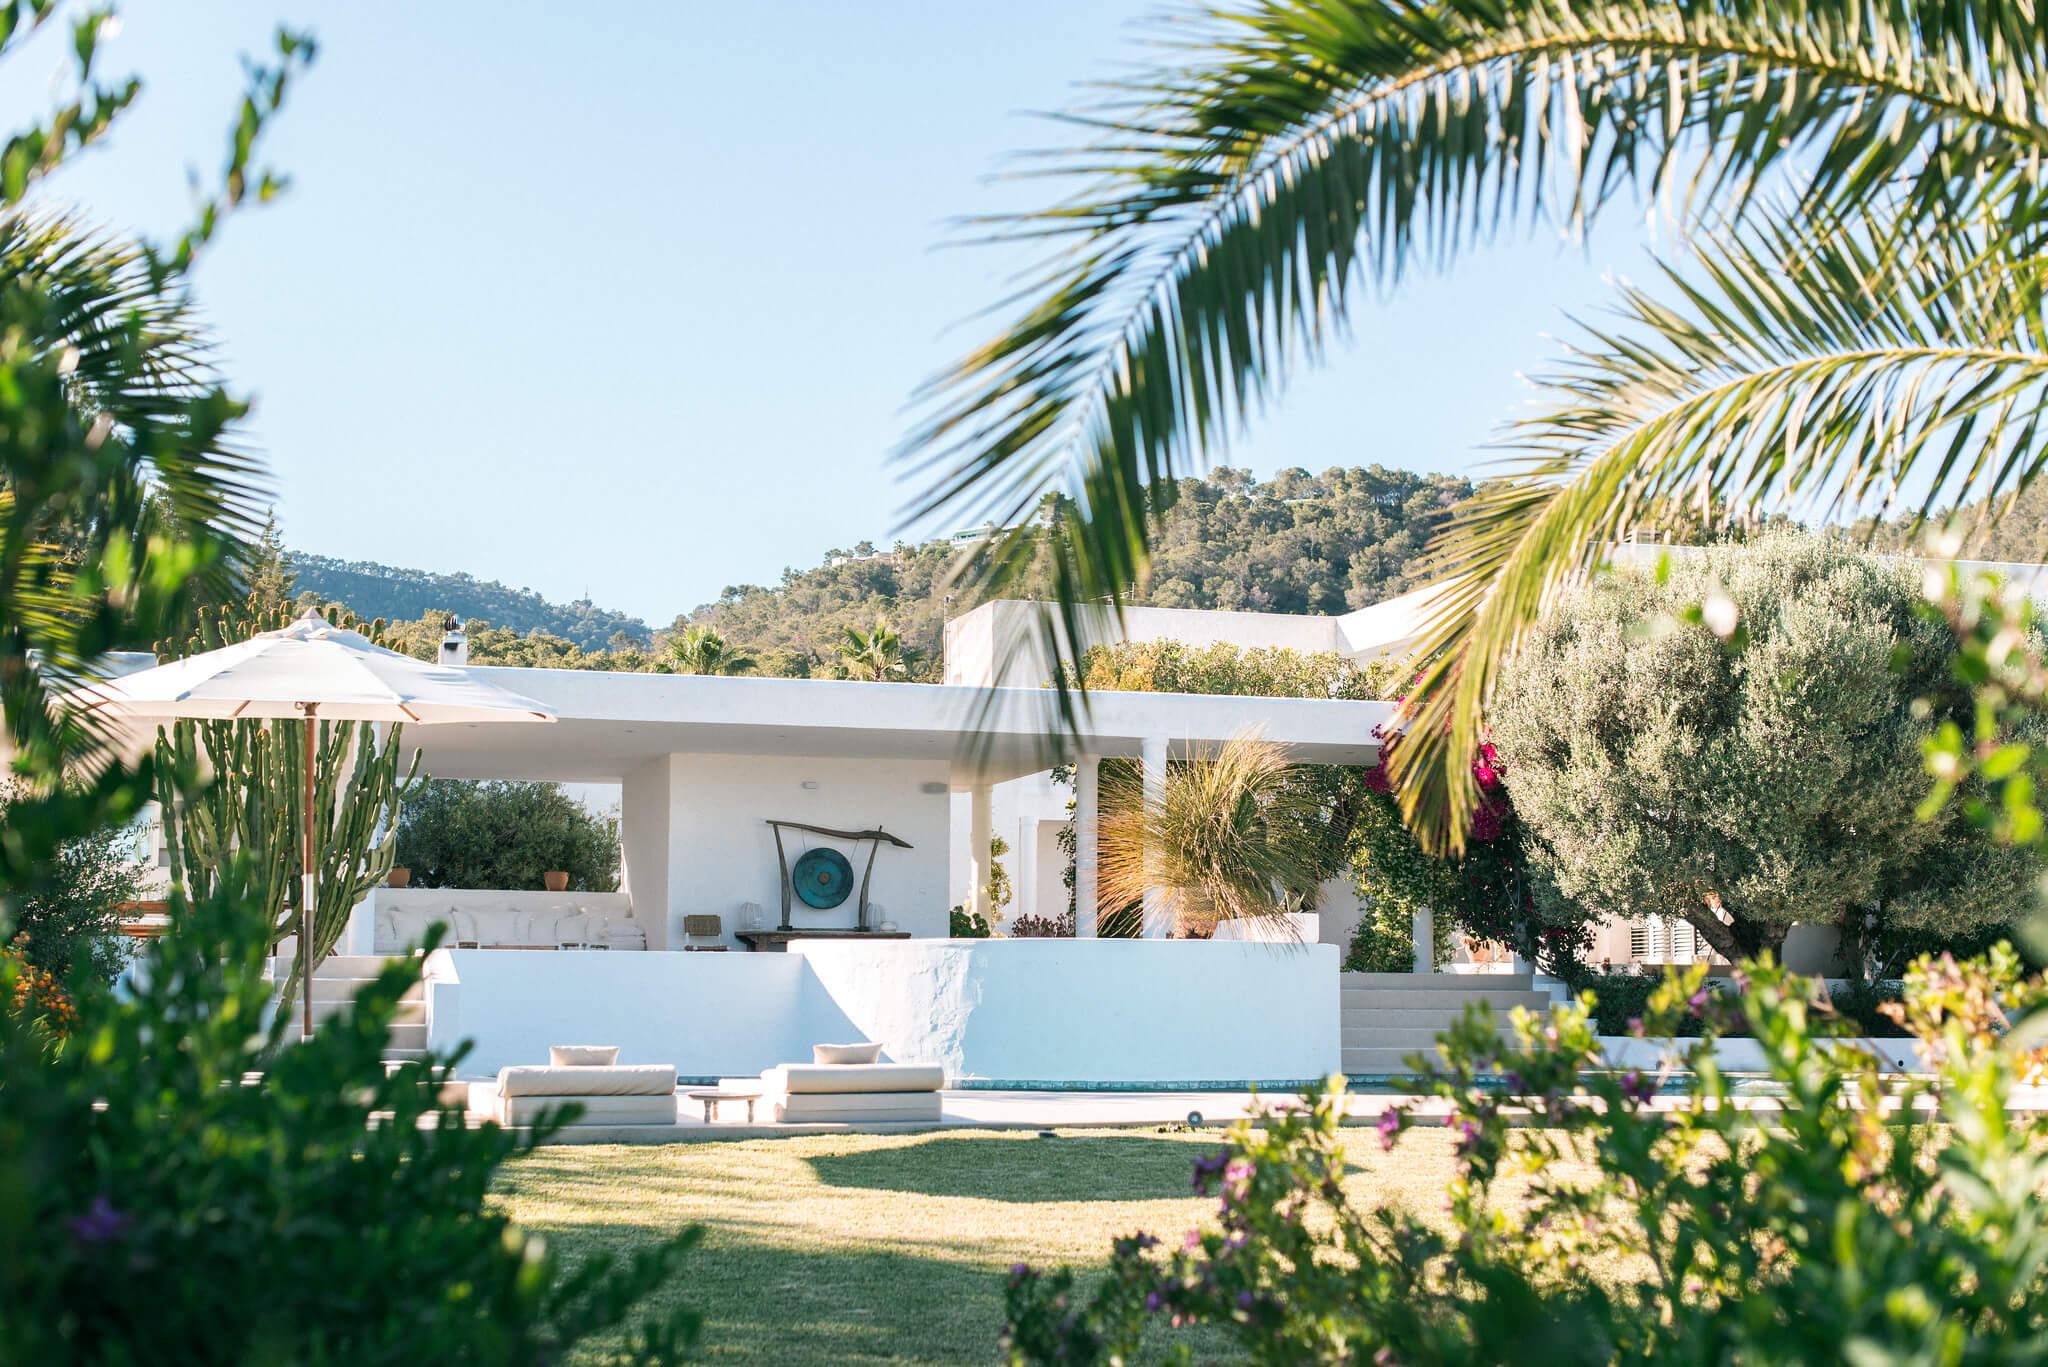 https://www.white-ibiza.com/wp-content/uploads/2020/06/white-ibiza-villas-casa-odette-exterior-through-trees.jpg